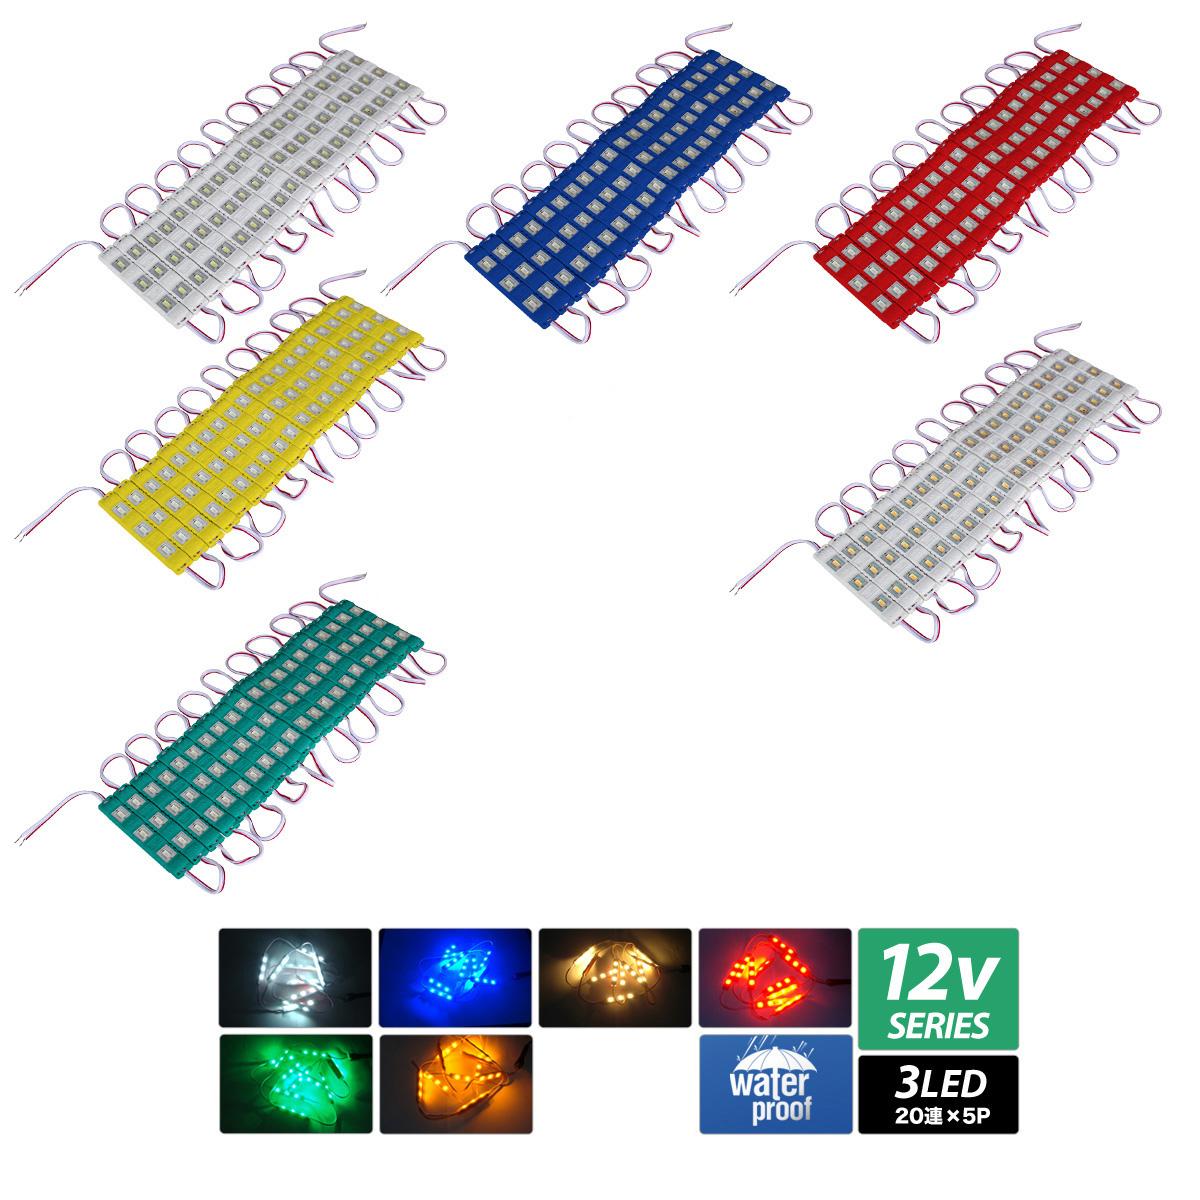 LEDモジュール(HQ 5730) 12V 3LED 100連(20連×5SET) [単体]